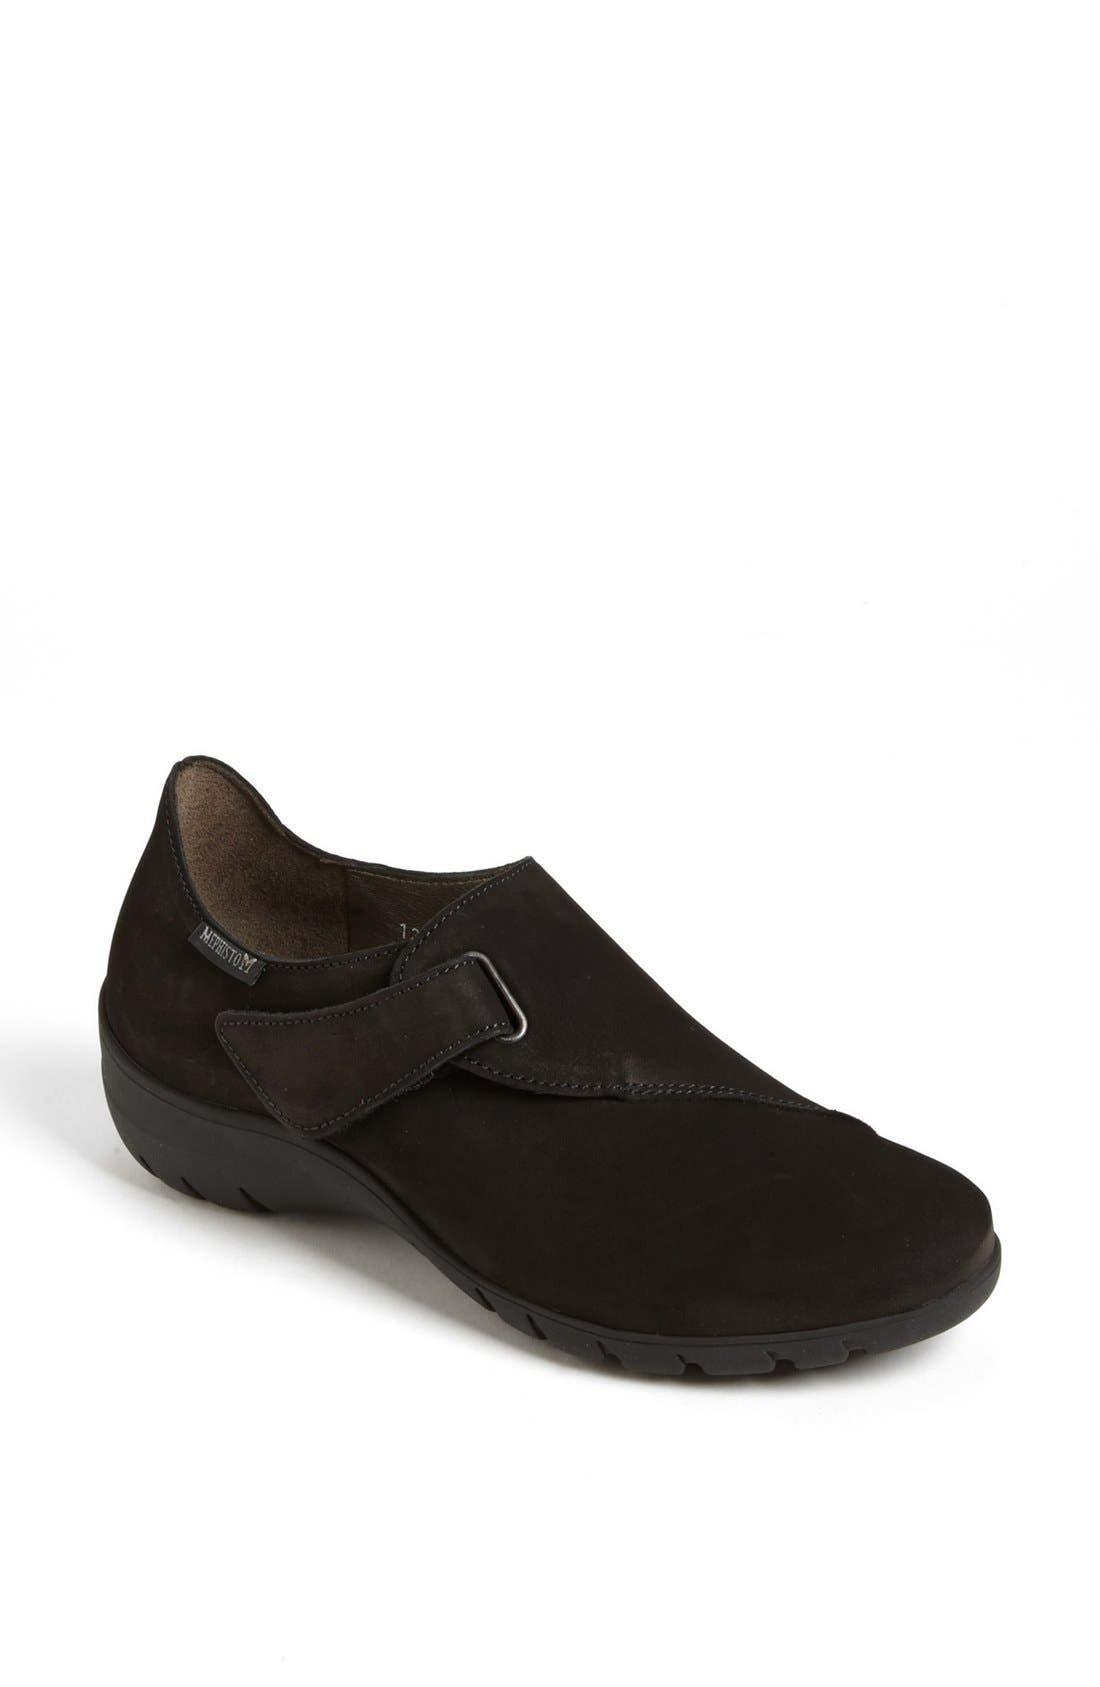 MEPHISTO, 'Luce' Sneaker, Main thumbnail 1, color, BLACK BUCKSOFT